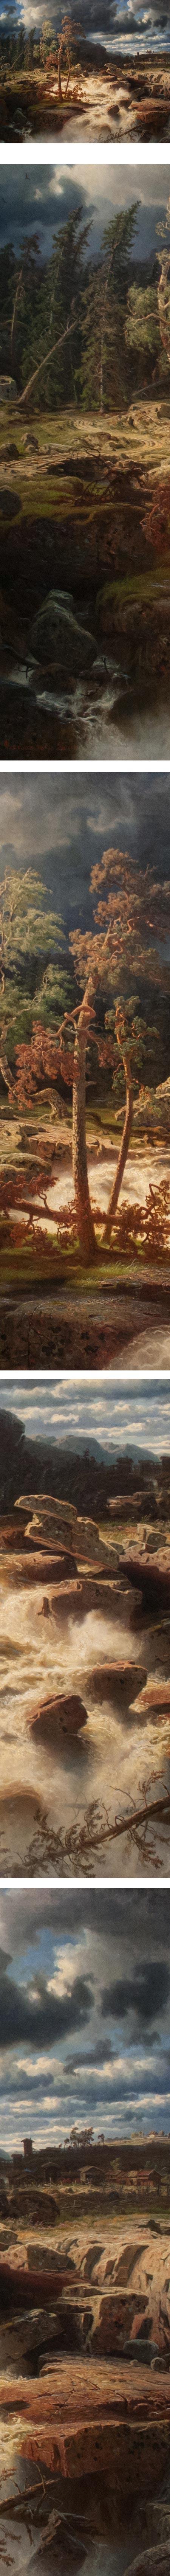 Waterfall in Smaland, Marcus Larson